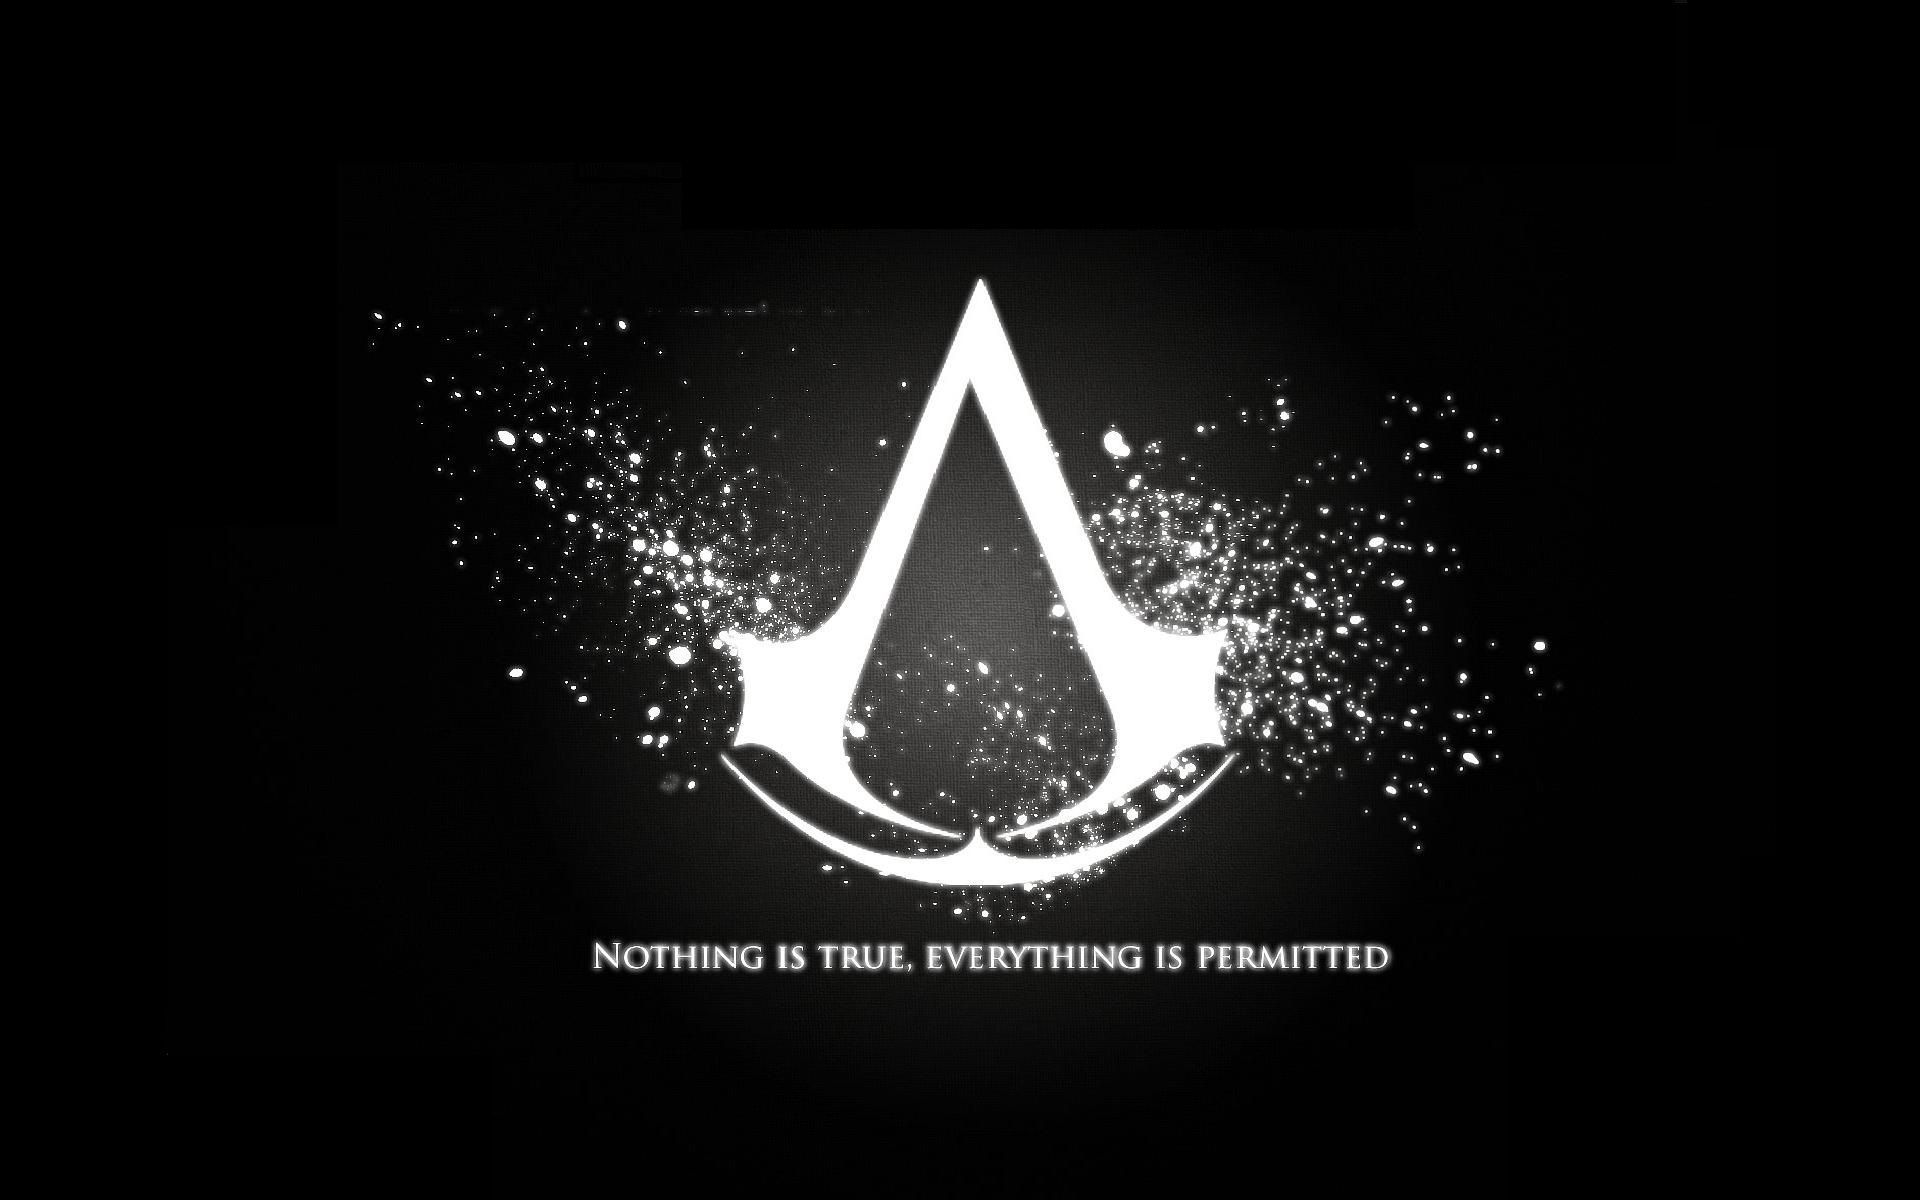 Logo Assassins Creed Wallpaper Hds Assassin S Creed Wallpaper Assassins Creed Assassins Creed Logo